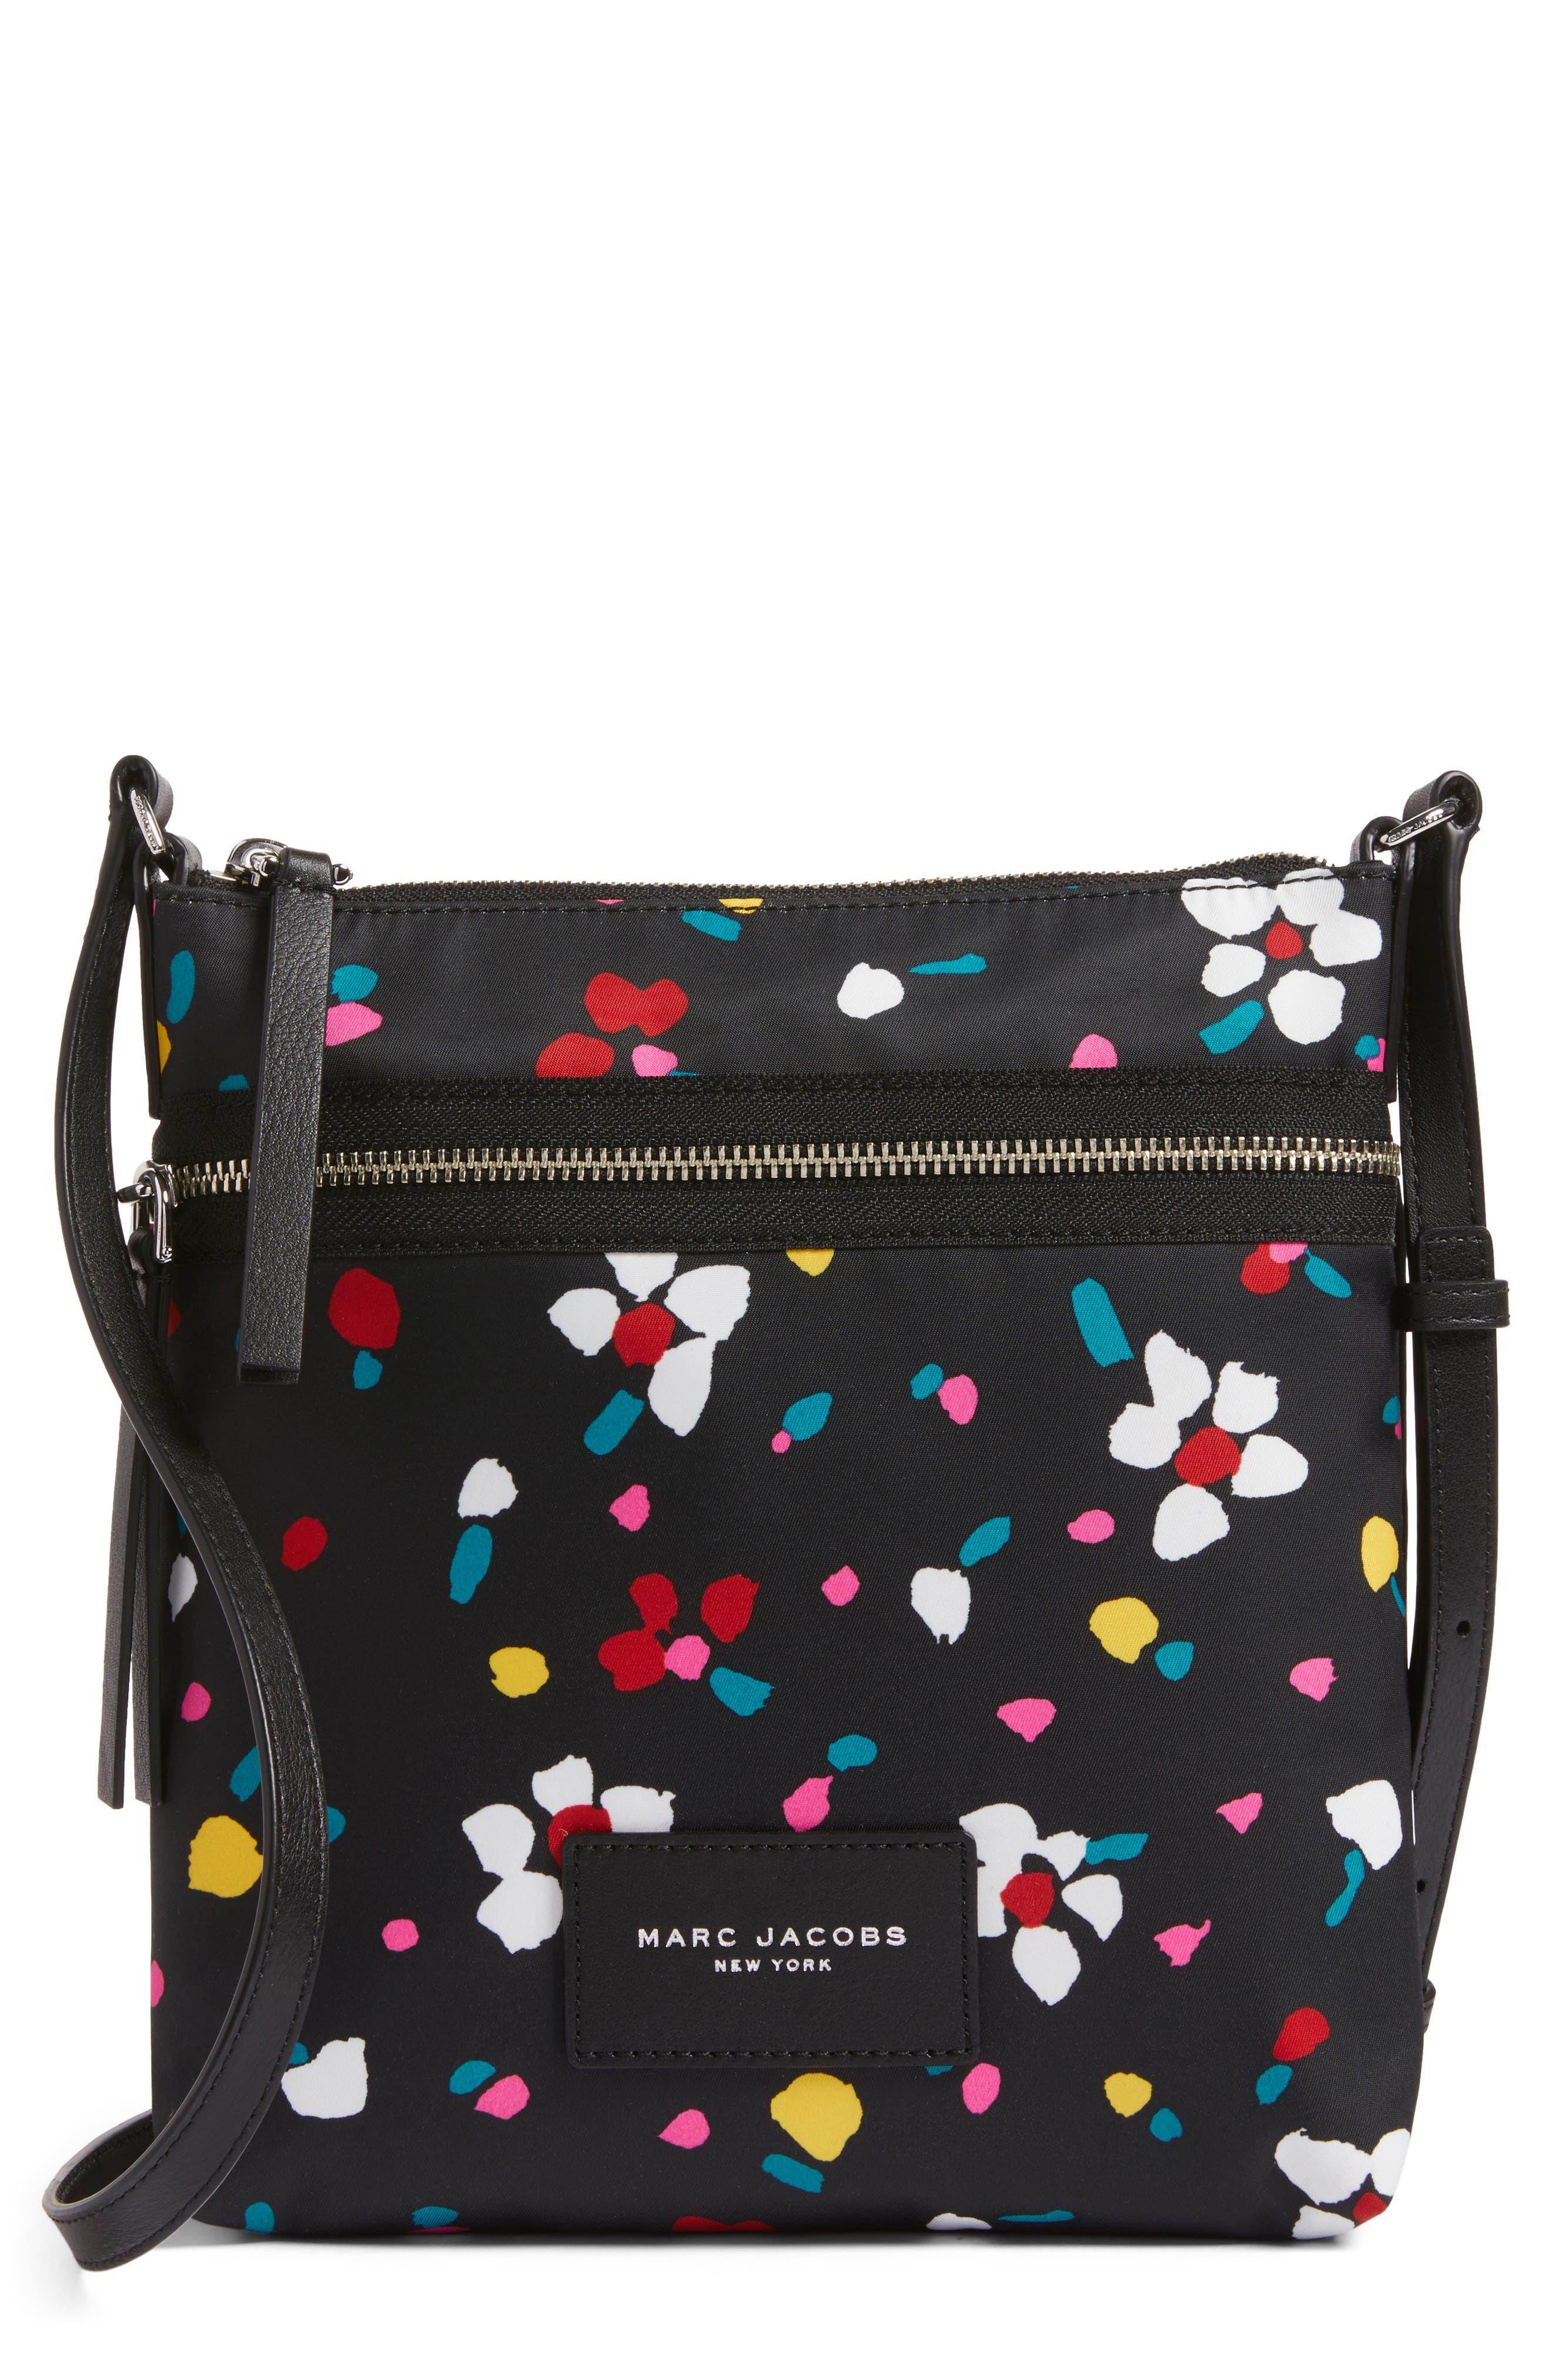 MARC JACOBS North/South Crossbody Bag